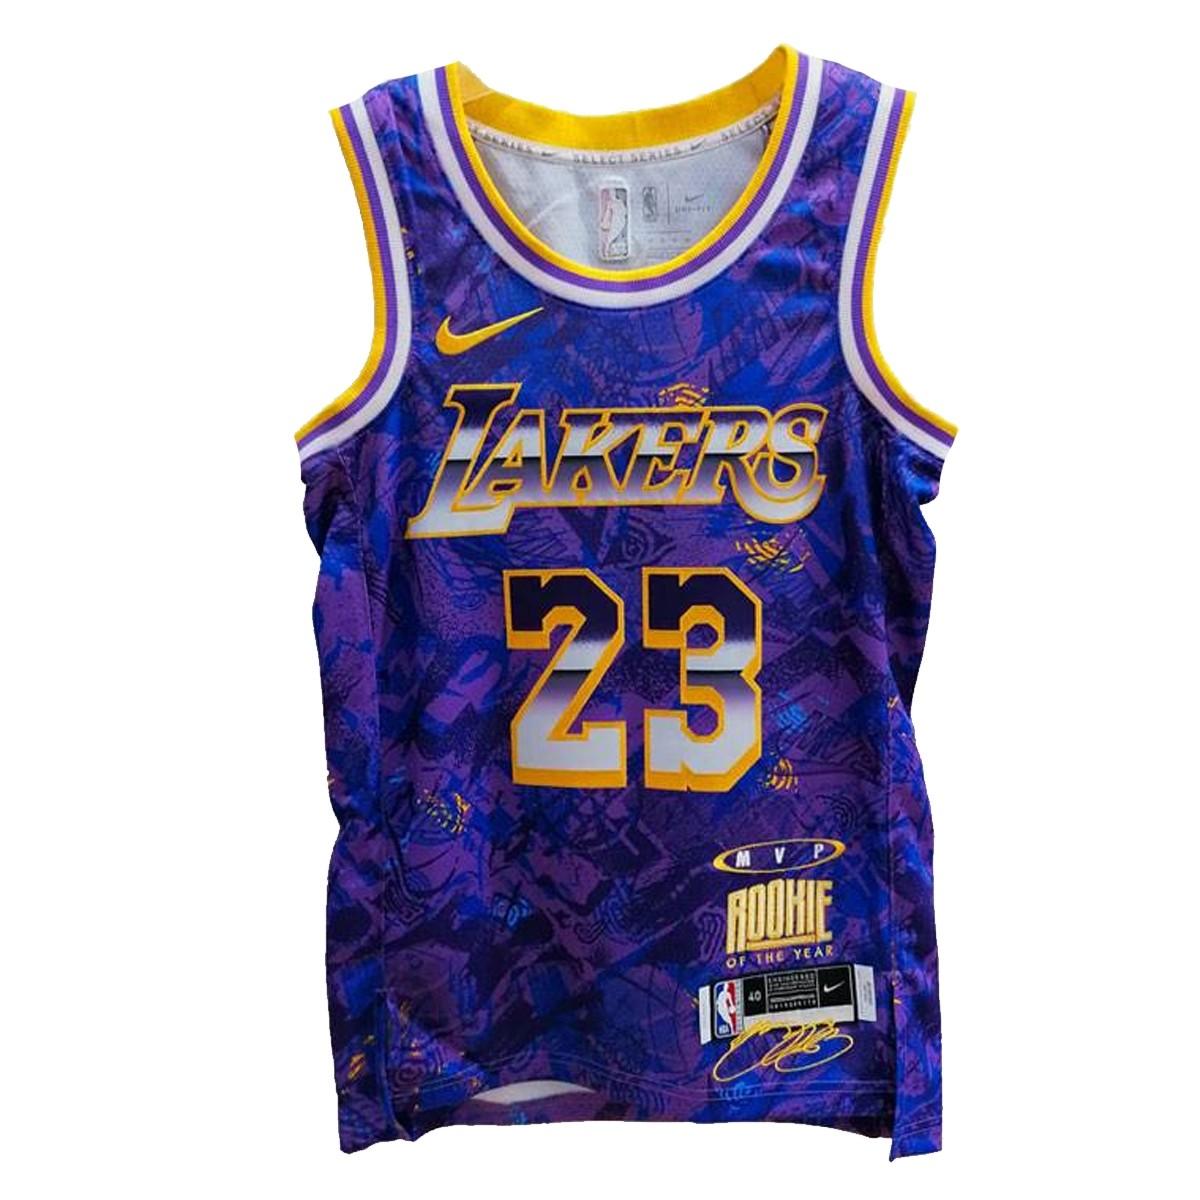 Nike Select Series Jersey 'LeBron James'